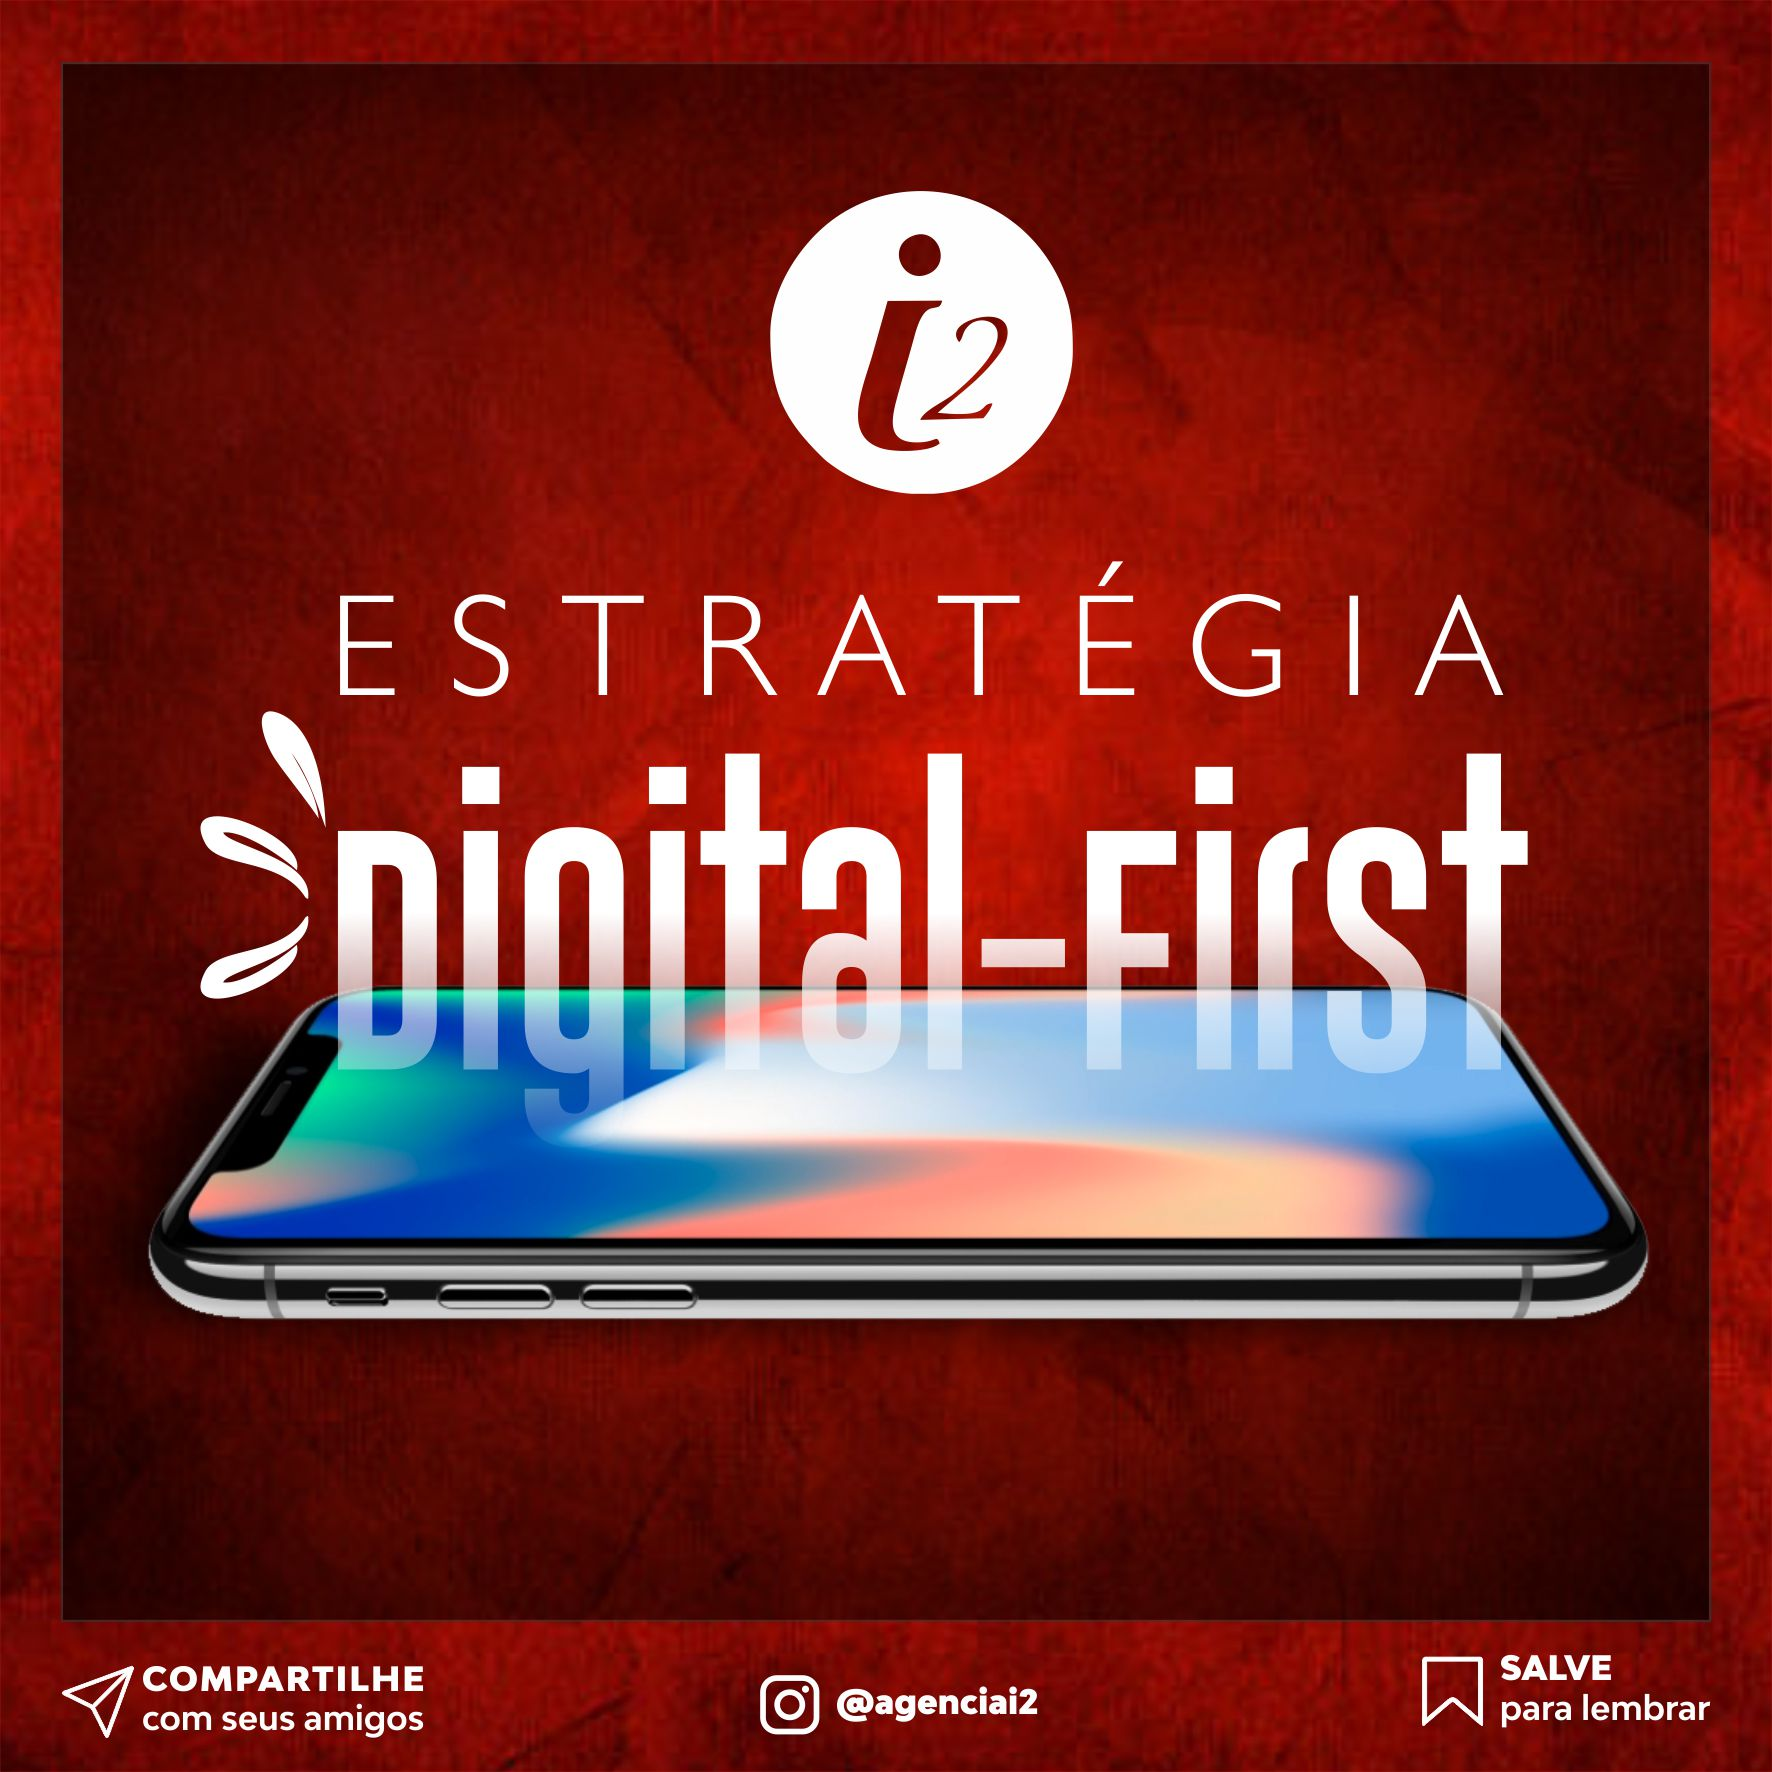 Estratégia Digital-First